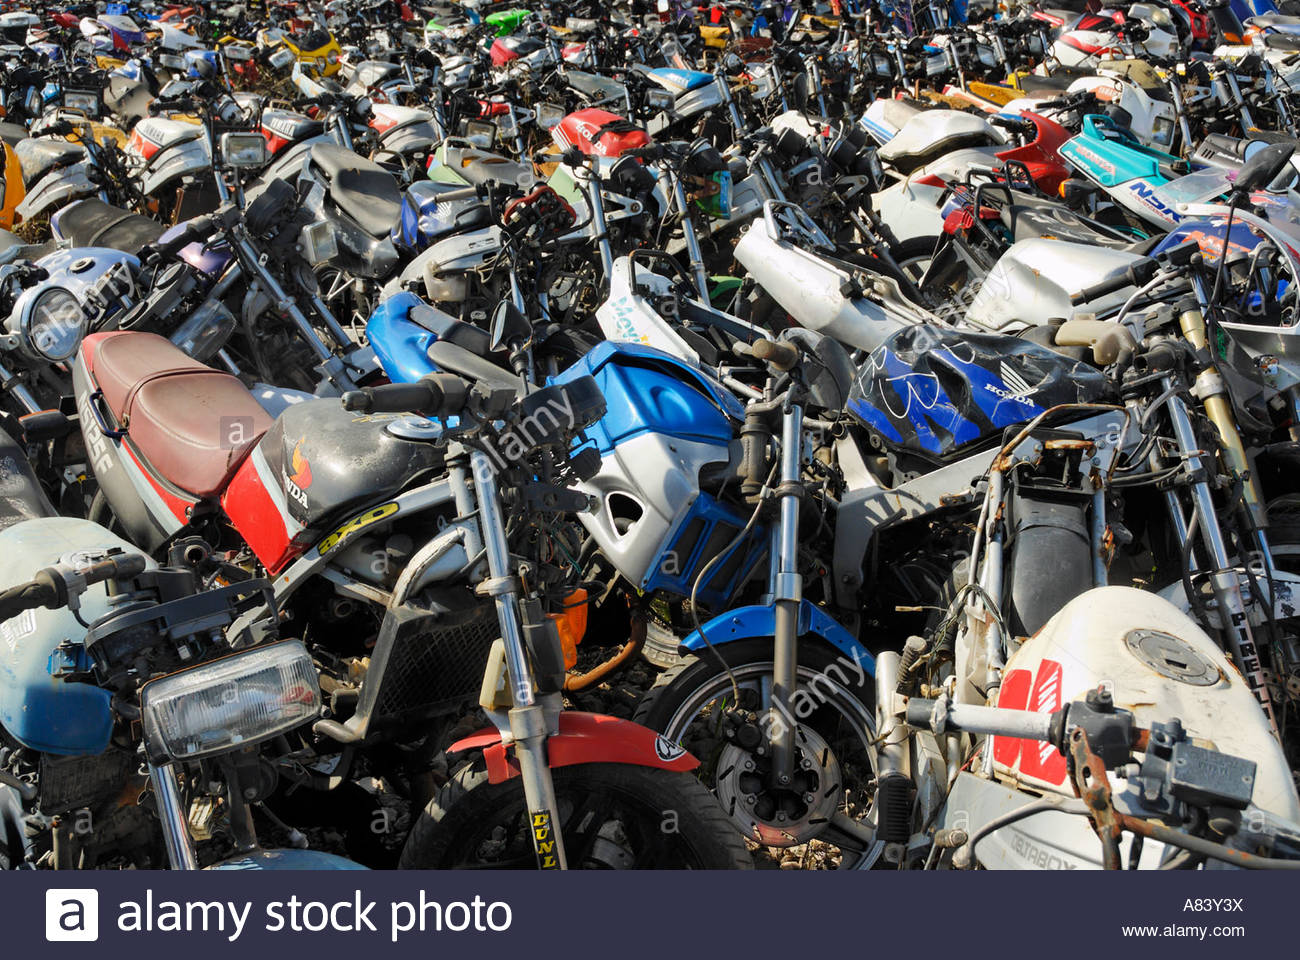 Motorcycle Scrapyard Stock Photo 11979229 Alamy